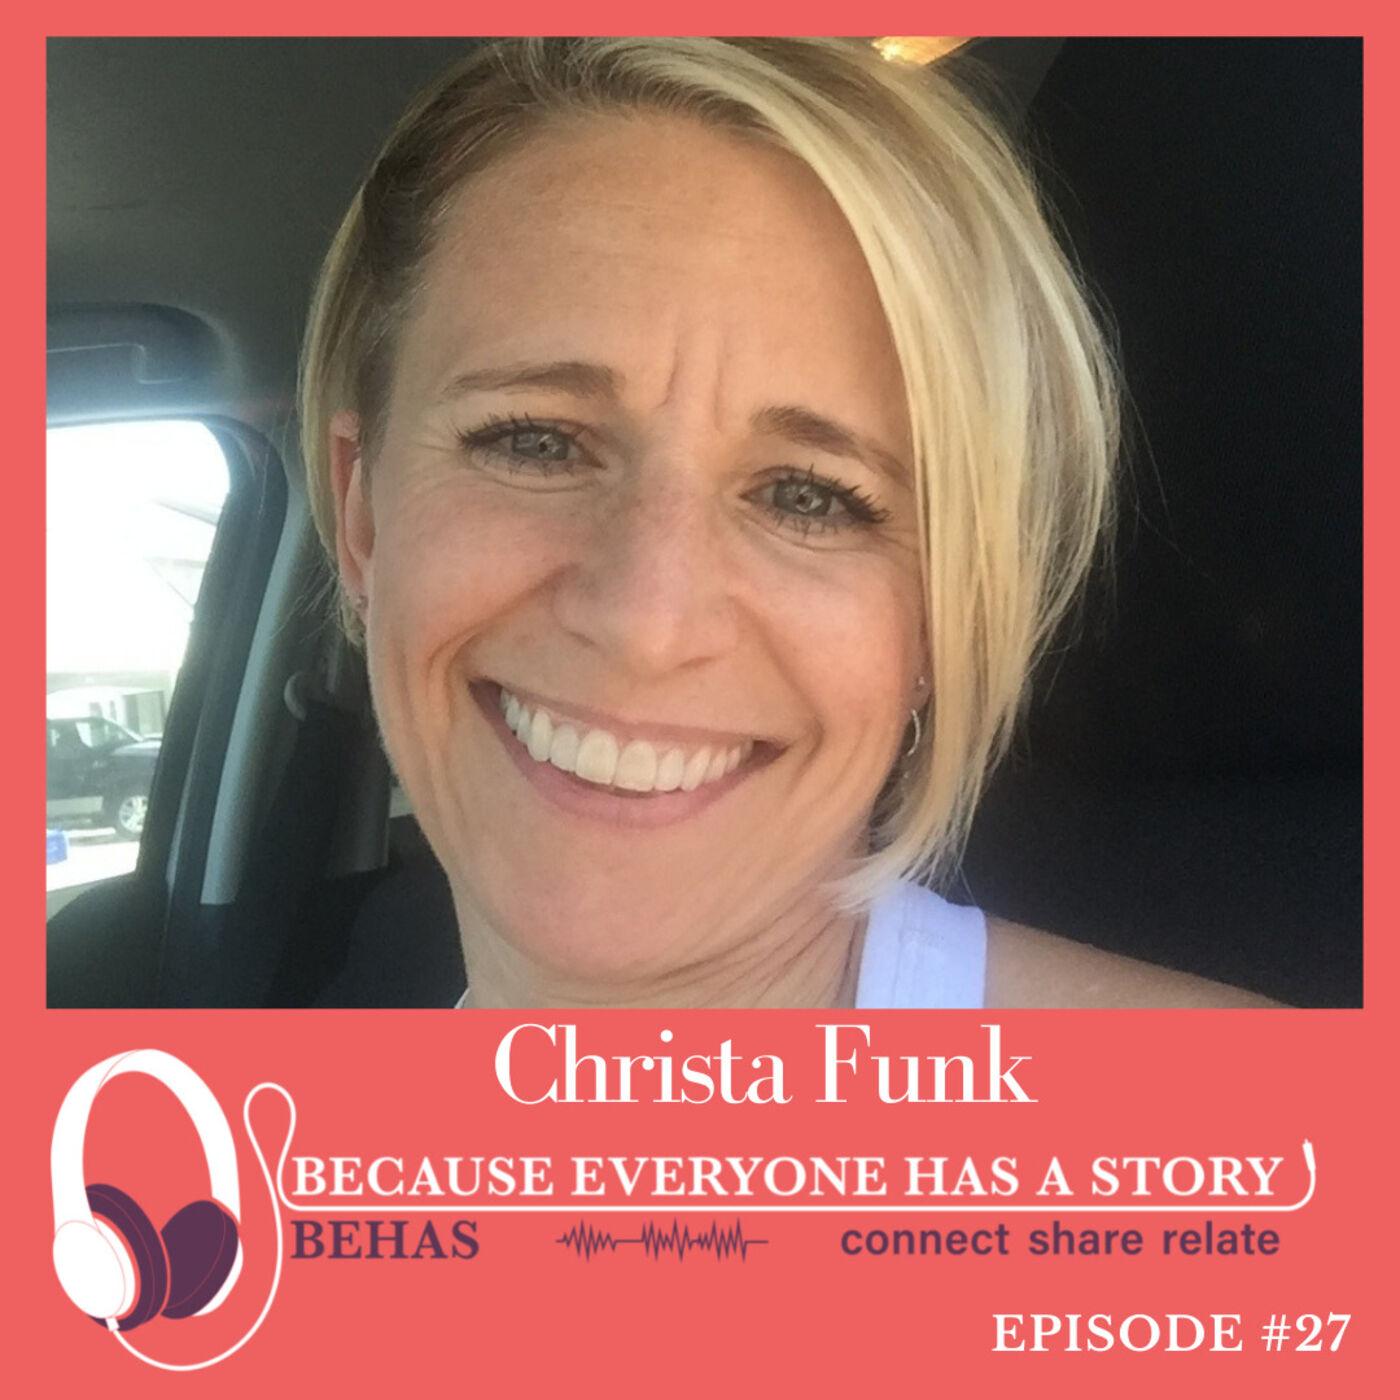 #27 - A Perfect Life – Christa Funk